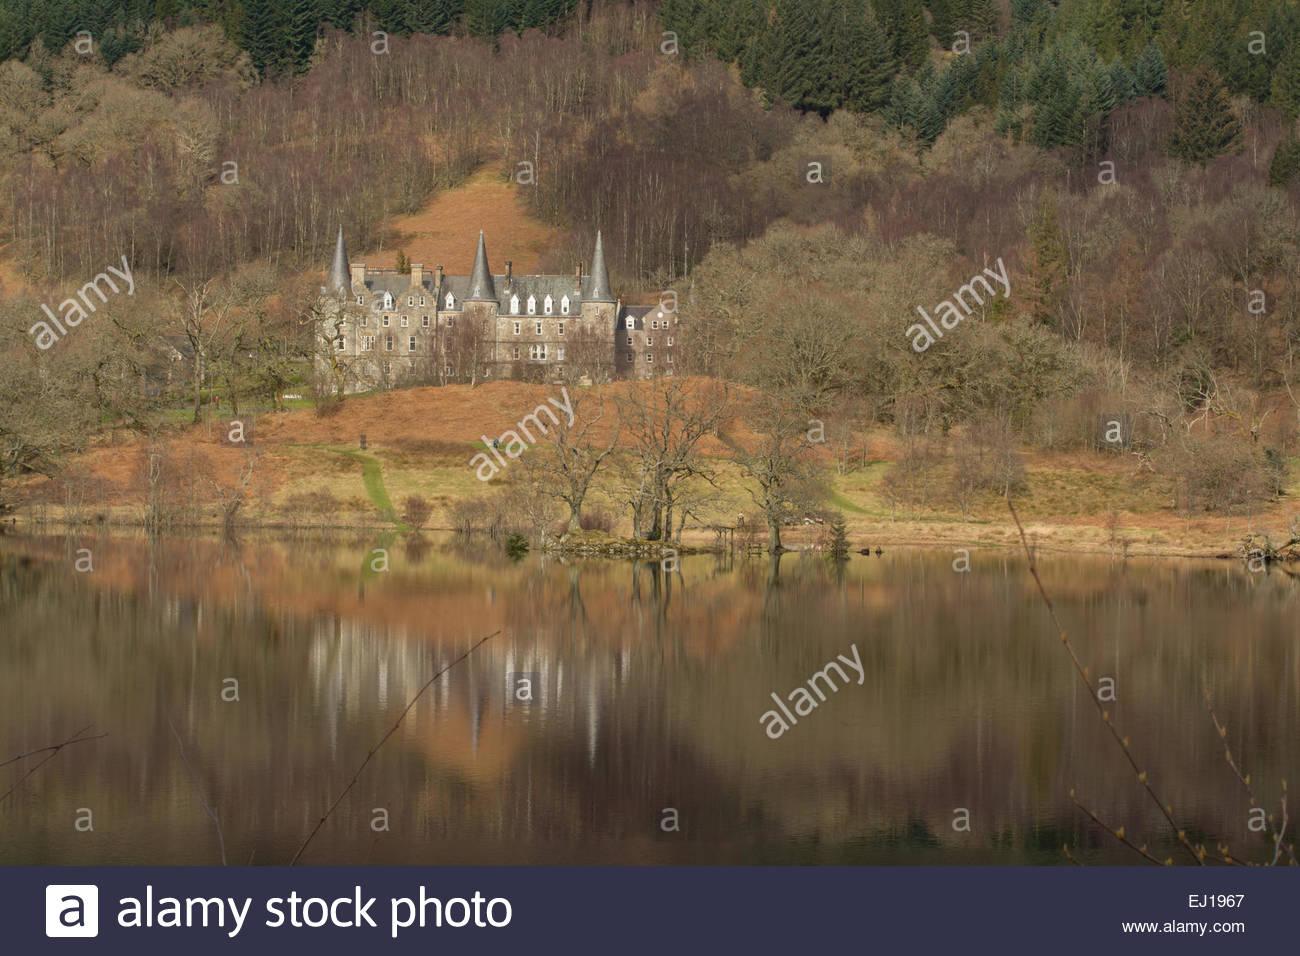 LOCH ACHRAY, LOCH LOMOND & THE TROSSACHS NATIONAL PARK, STIRLINGSHIRE, SCOTLAND, UK 2015: Tigh Mor Trossachs - Stock Image